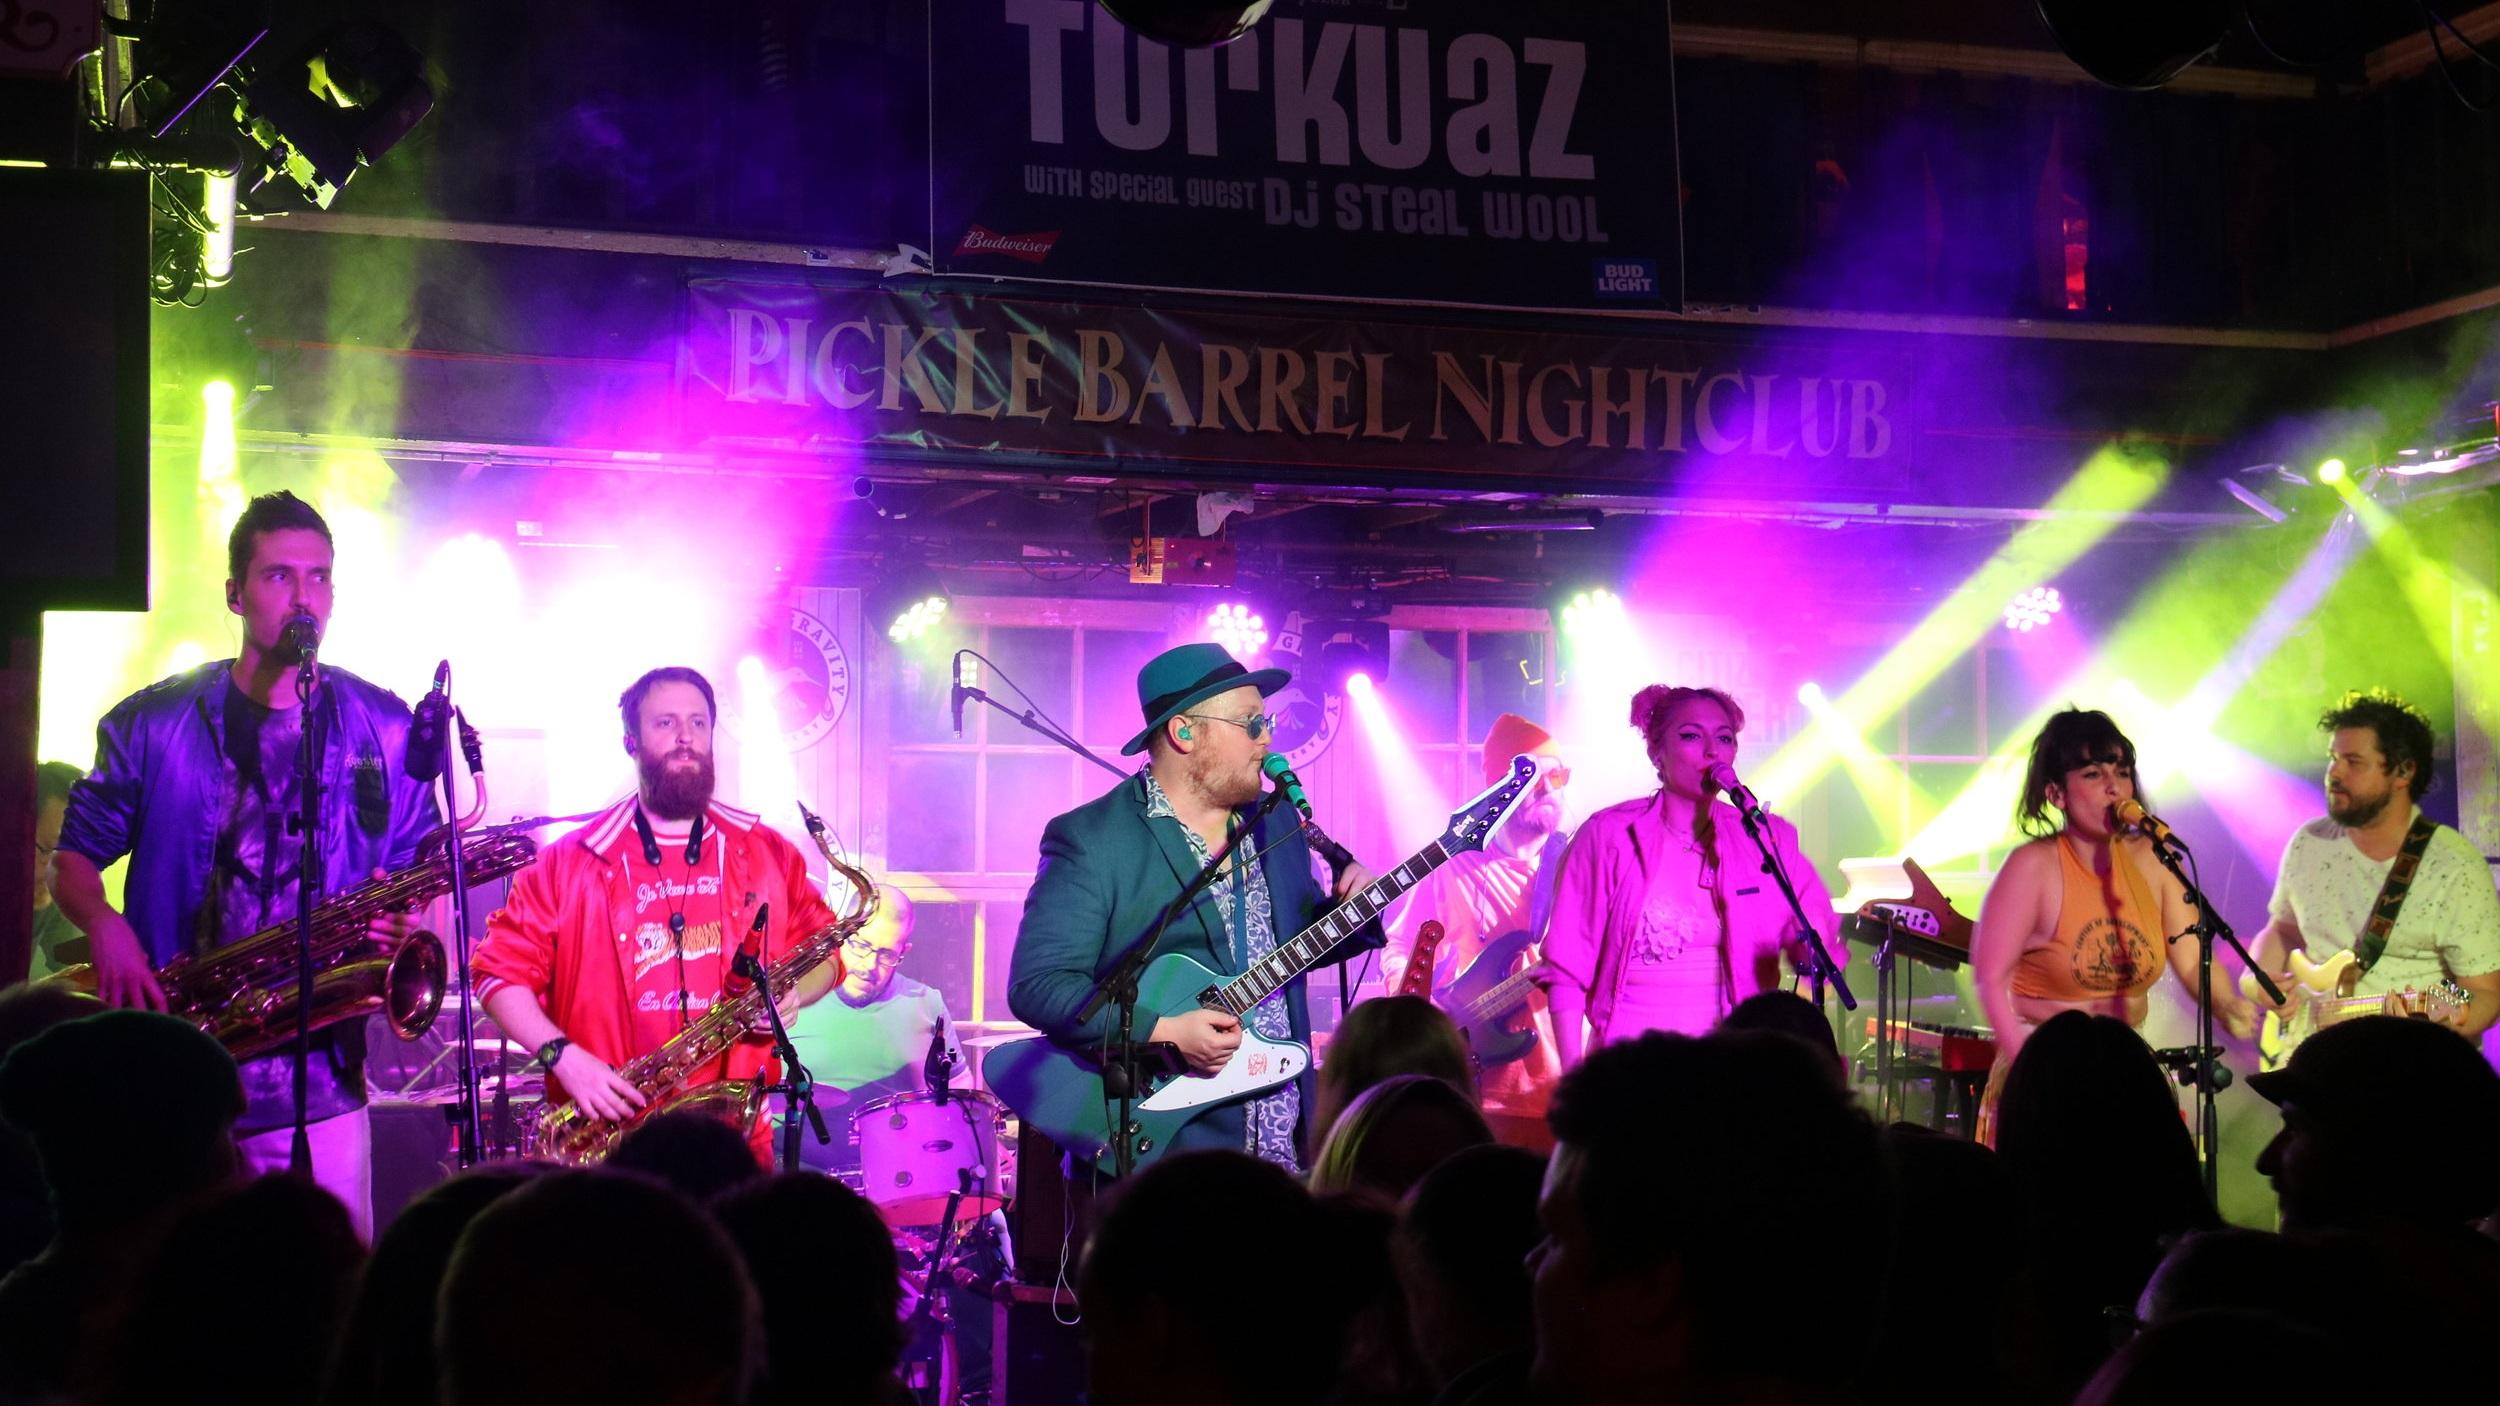 Turkuaz at the Pickle Barrel